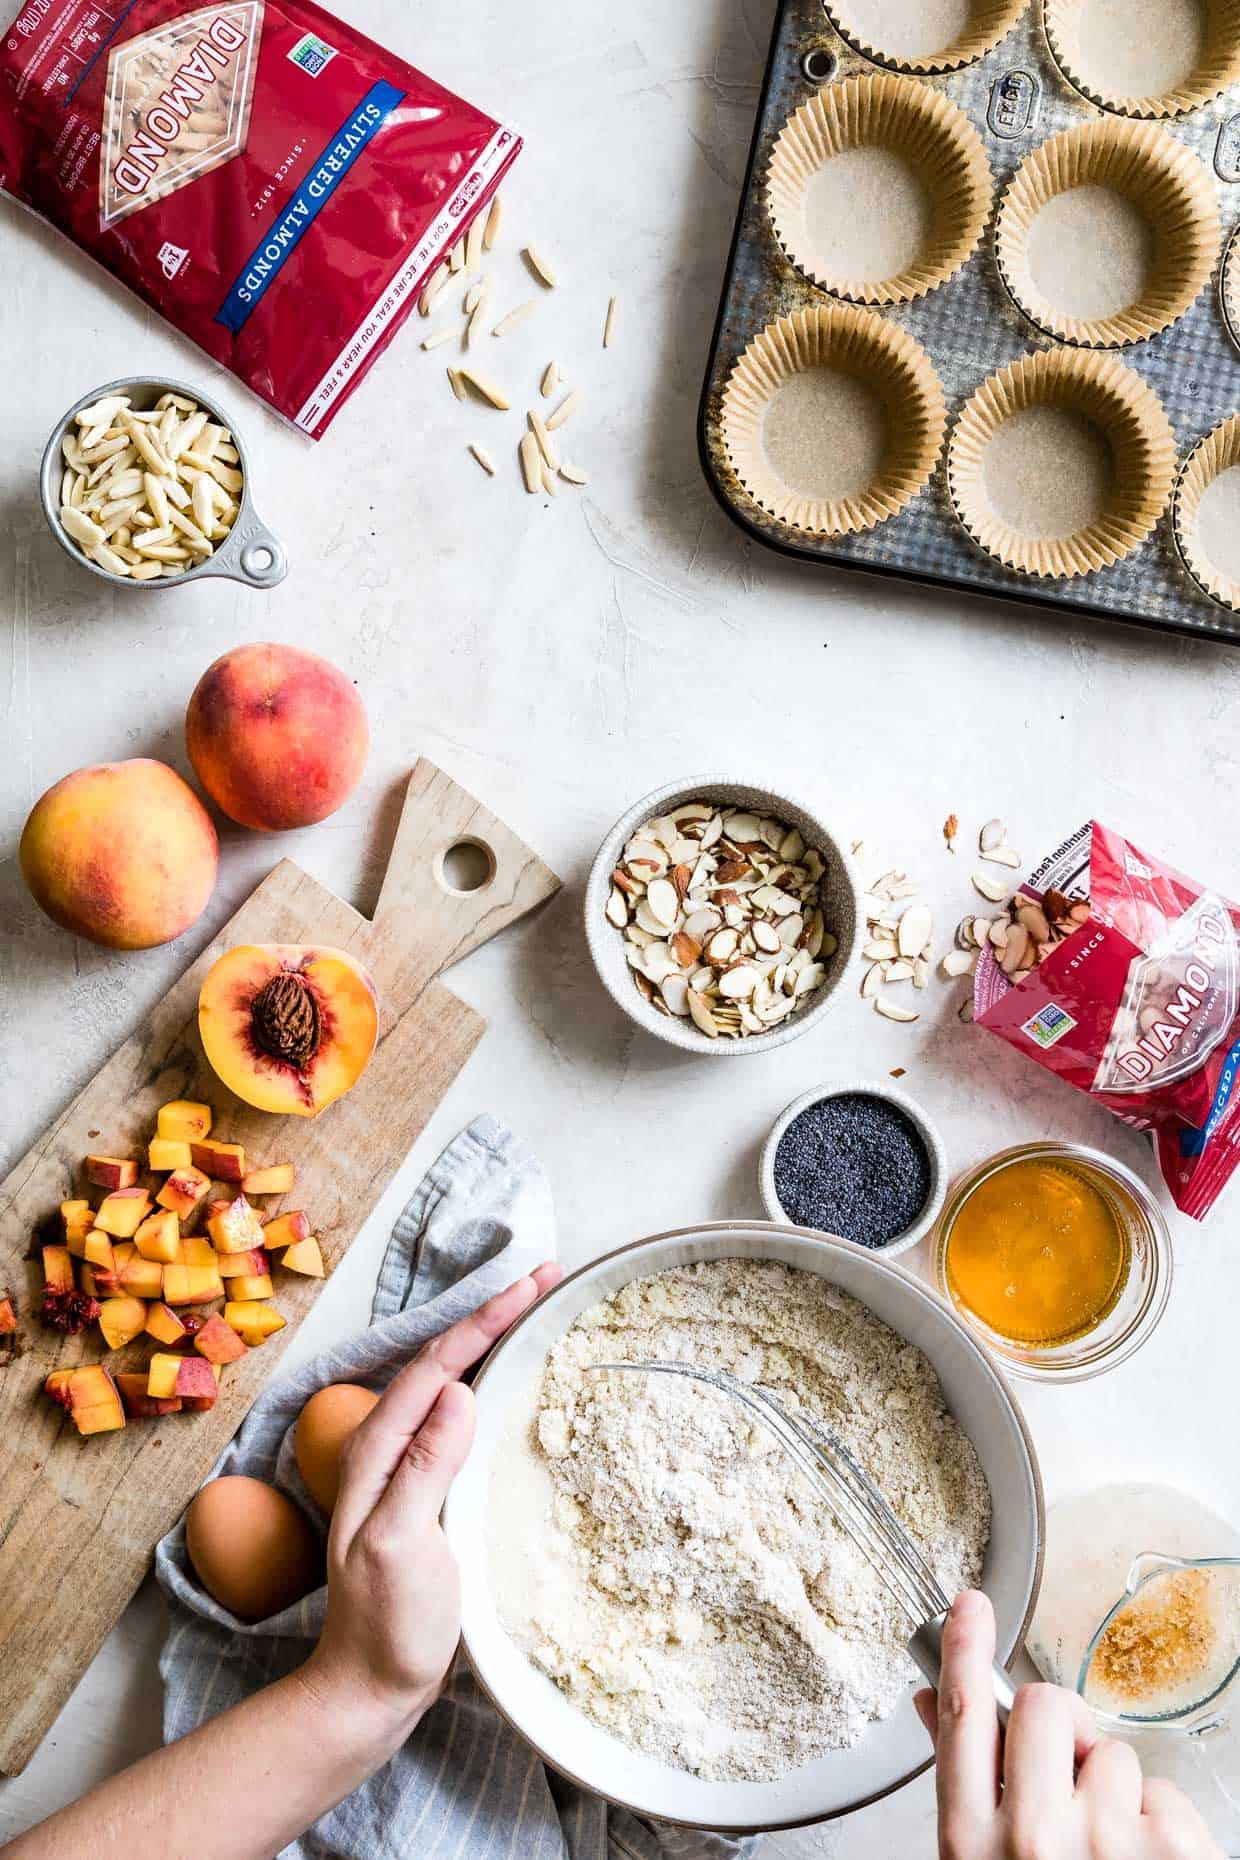 Poppy Seed Almond Flour Muffin Ingredients